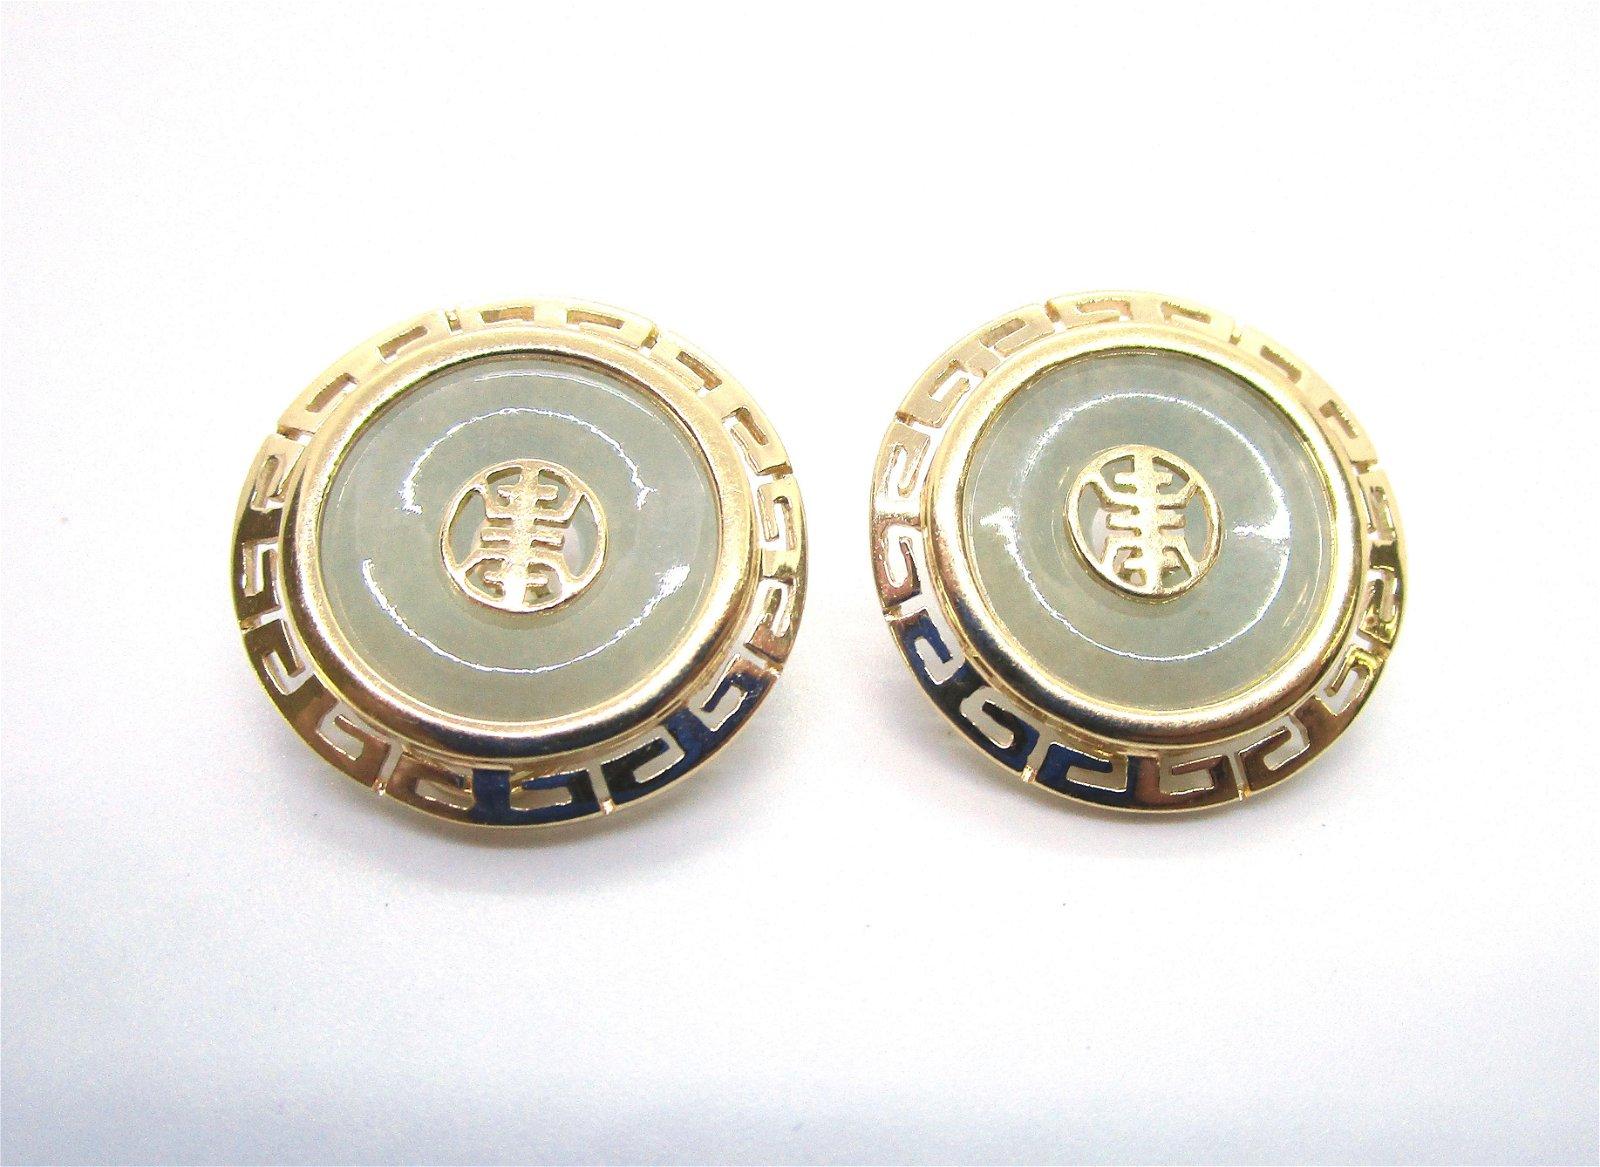 JADE EARRINGS 14K GOLD W CLIP 8.7 GRAMS